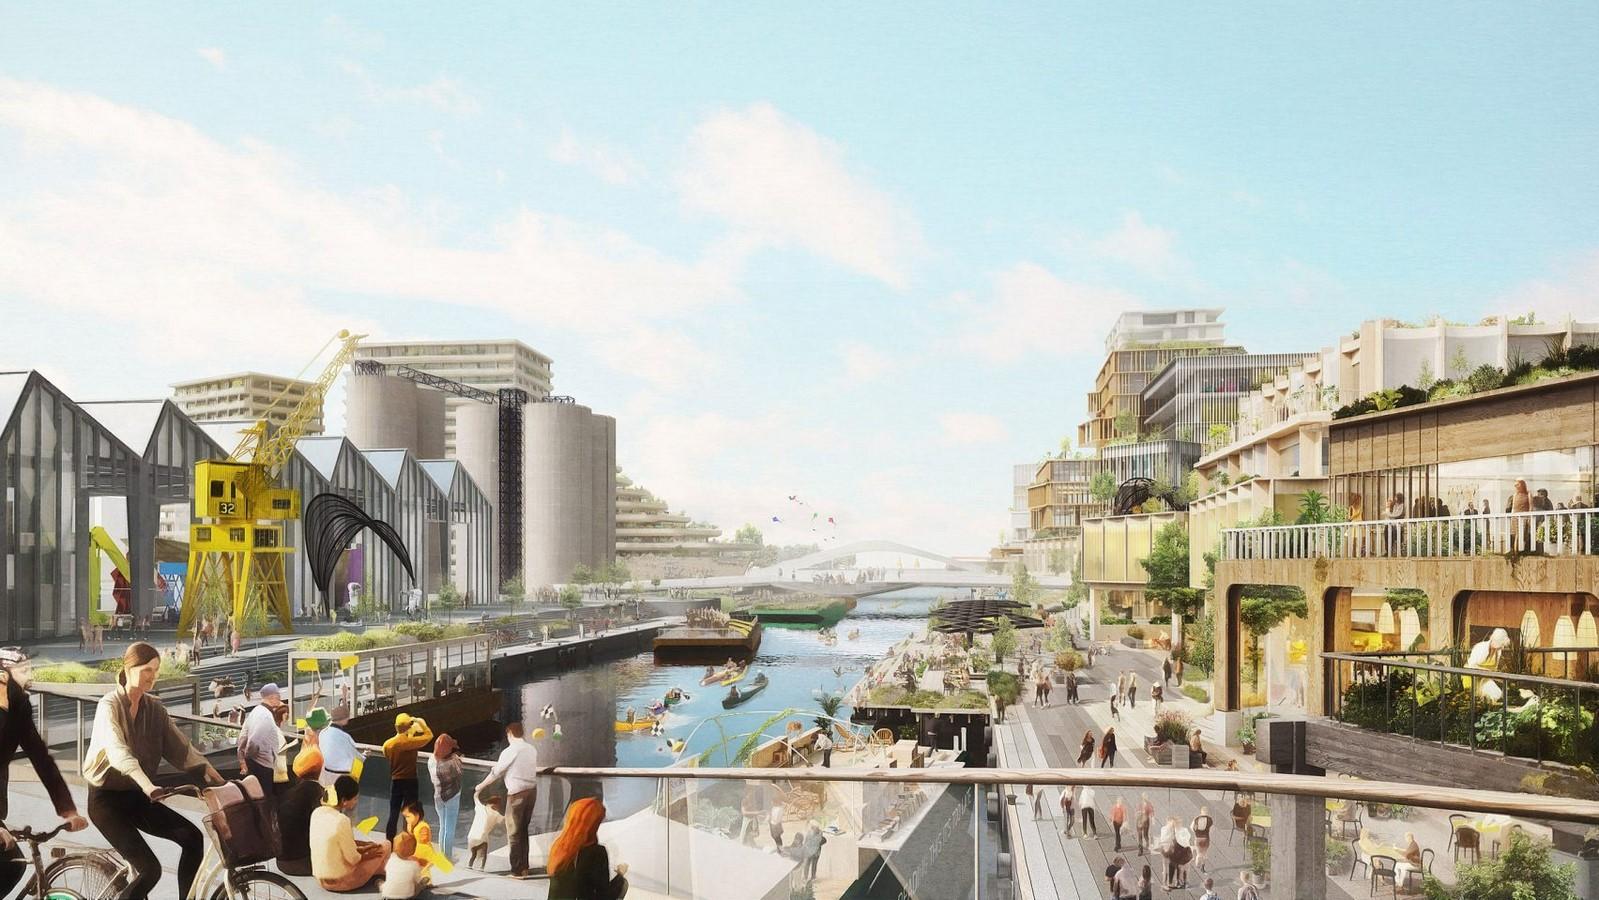 Alphabet's Sidewalk Labs by Snøhetta and Thomas Heatherwick: Mass-timber city - Sheet3